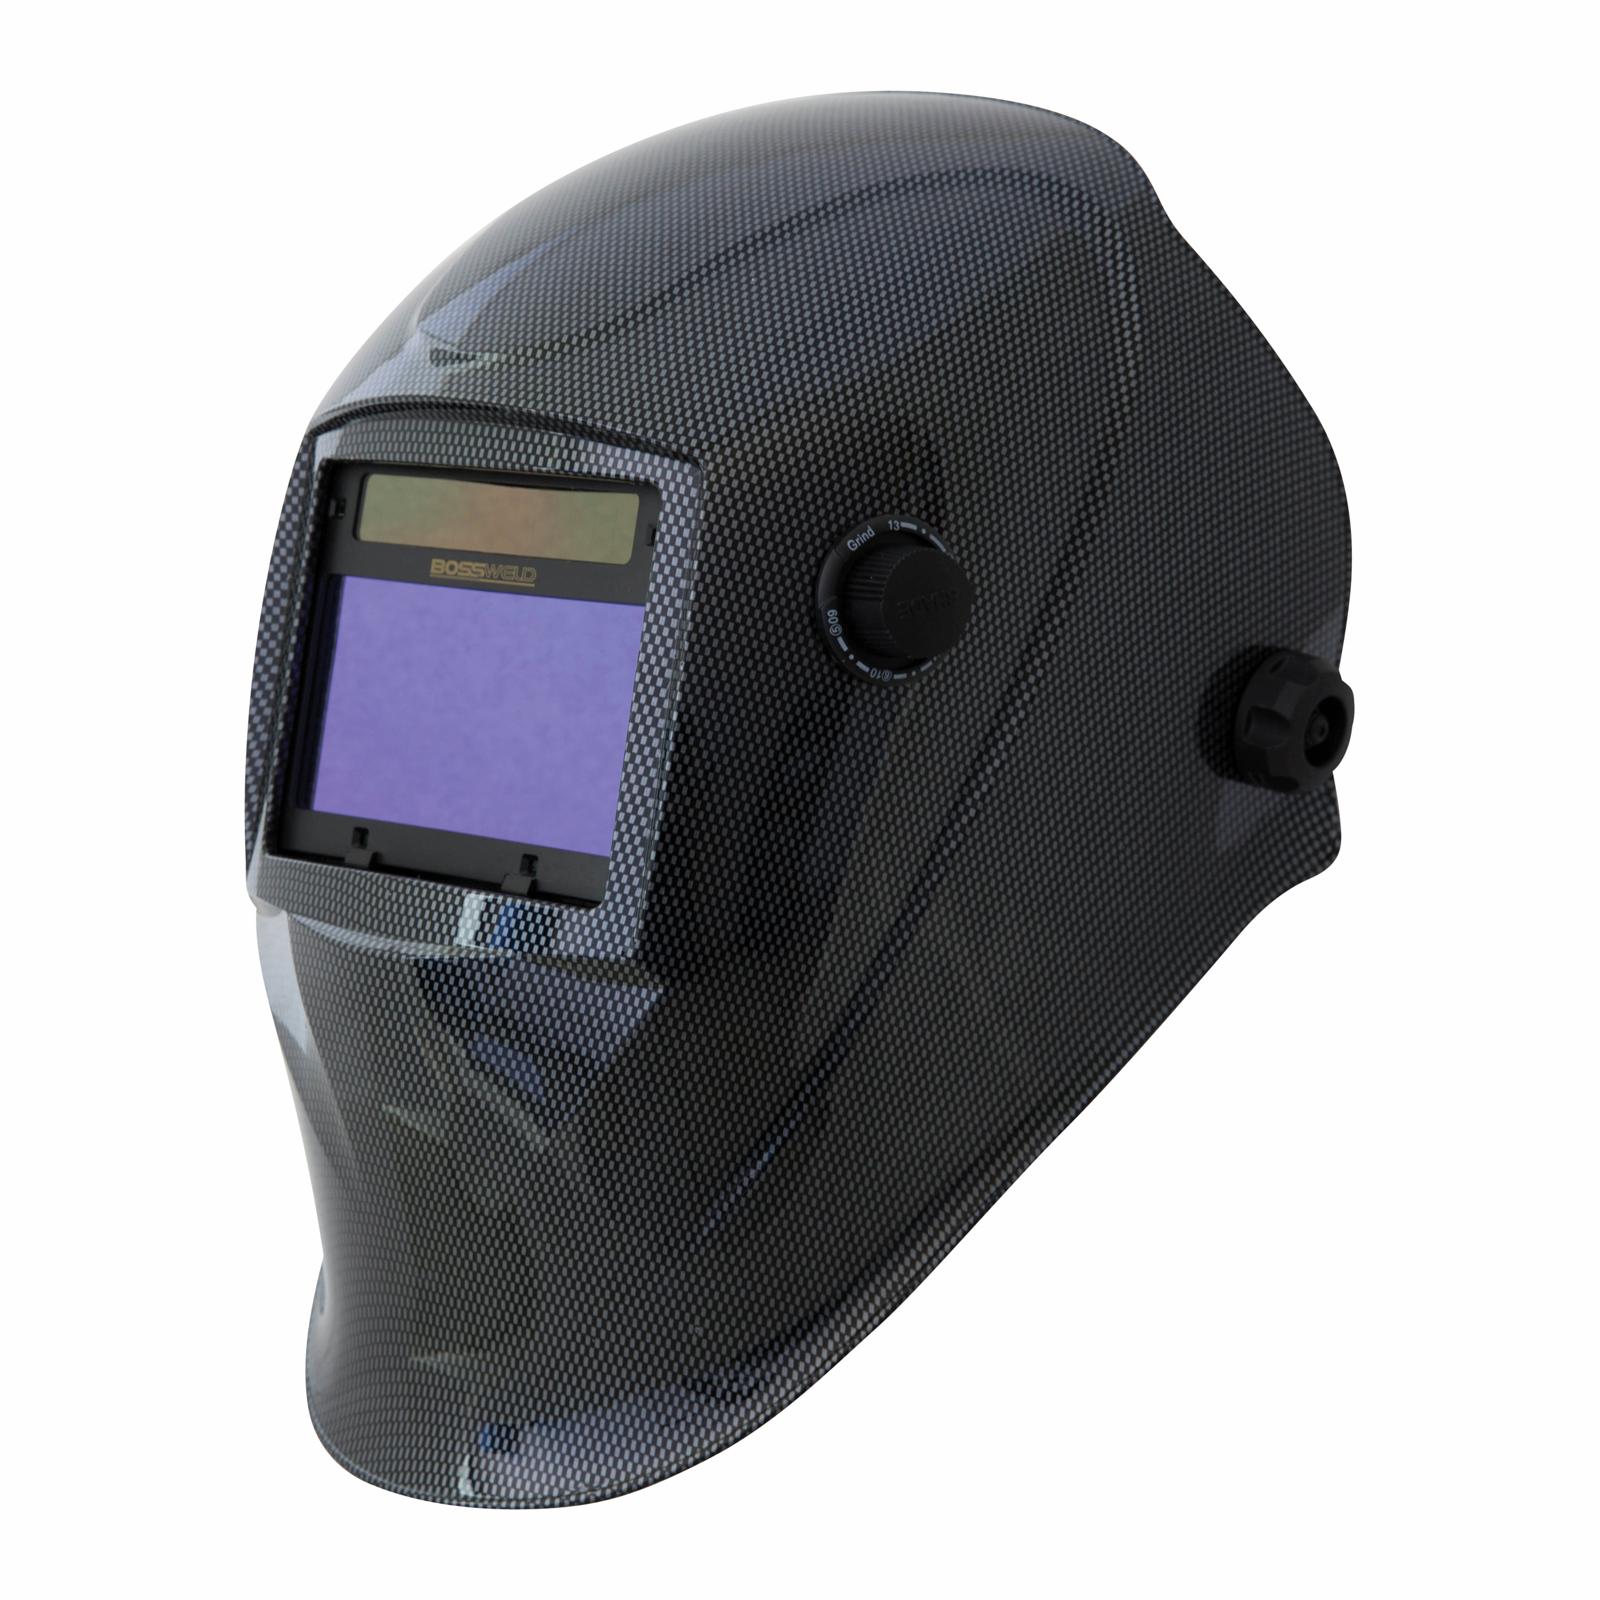 Bossweld Carbon Variable Shade Electronic Welding Helmet